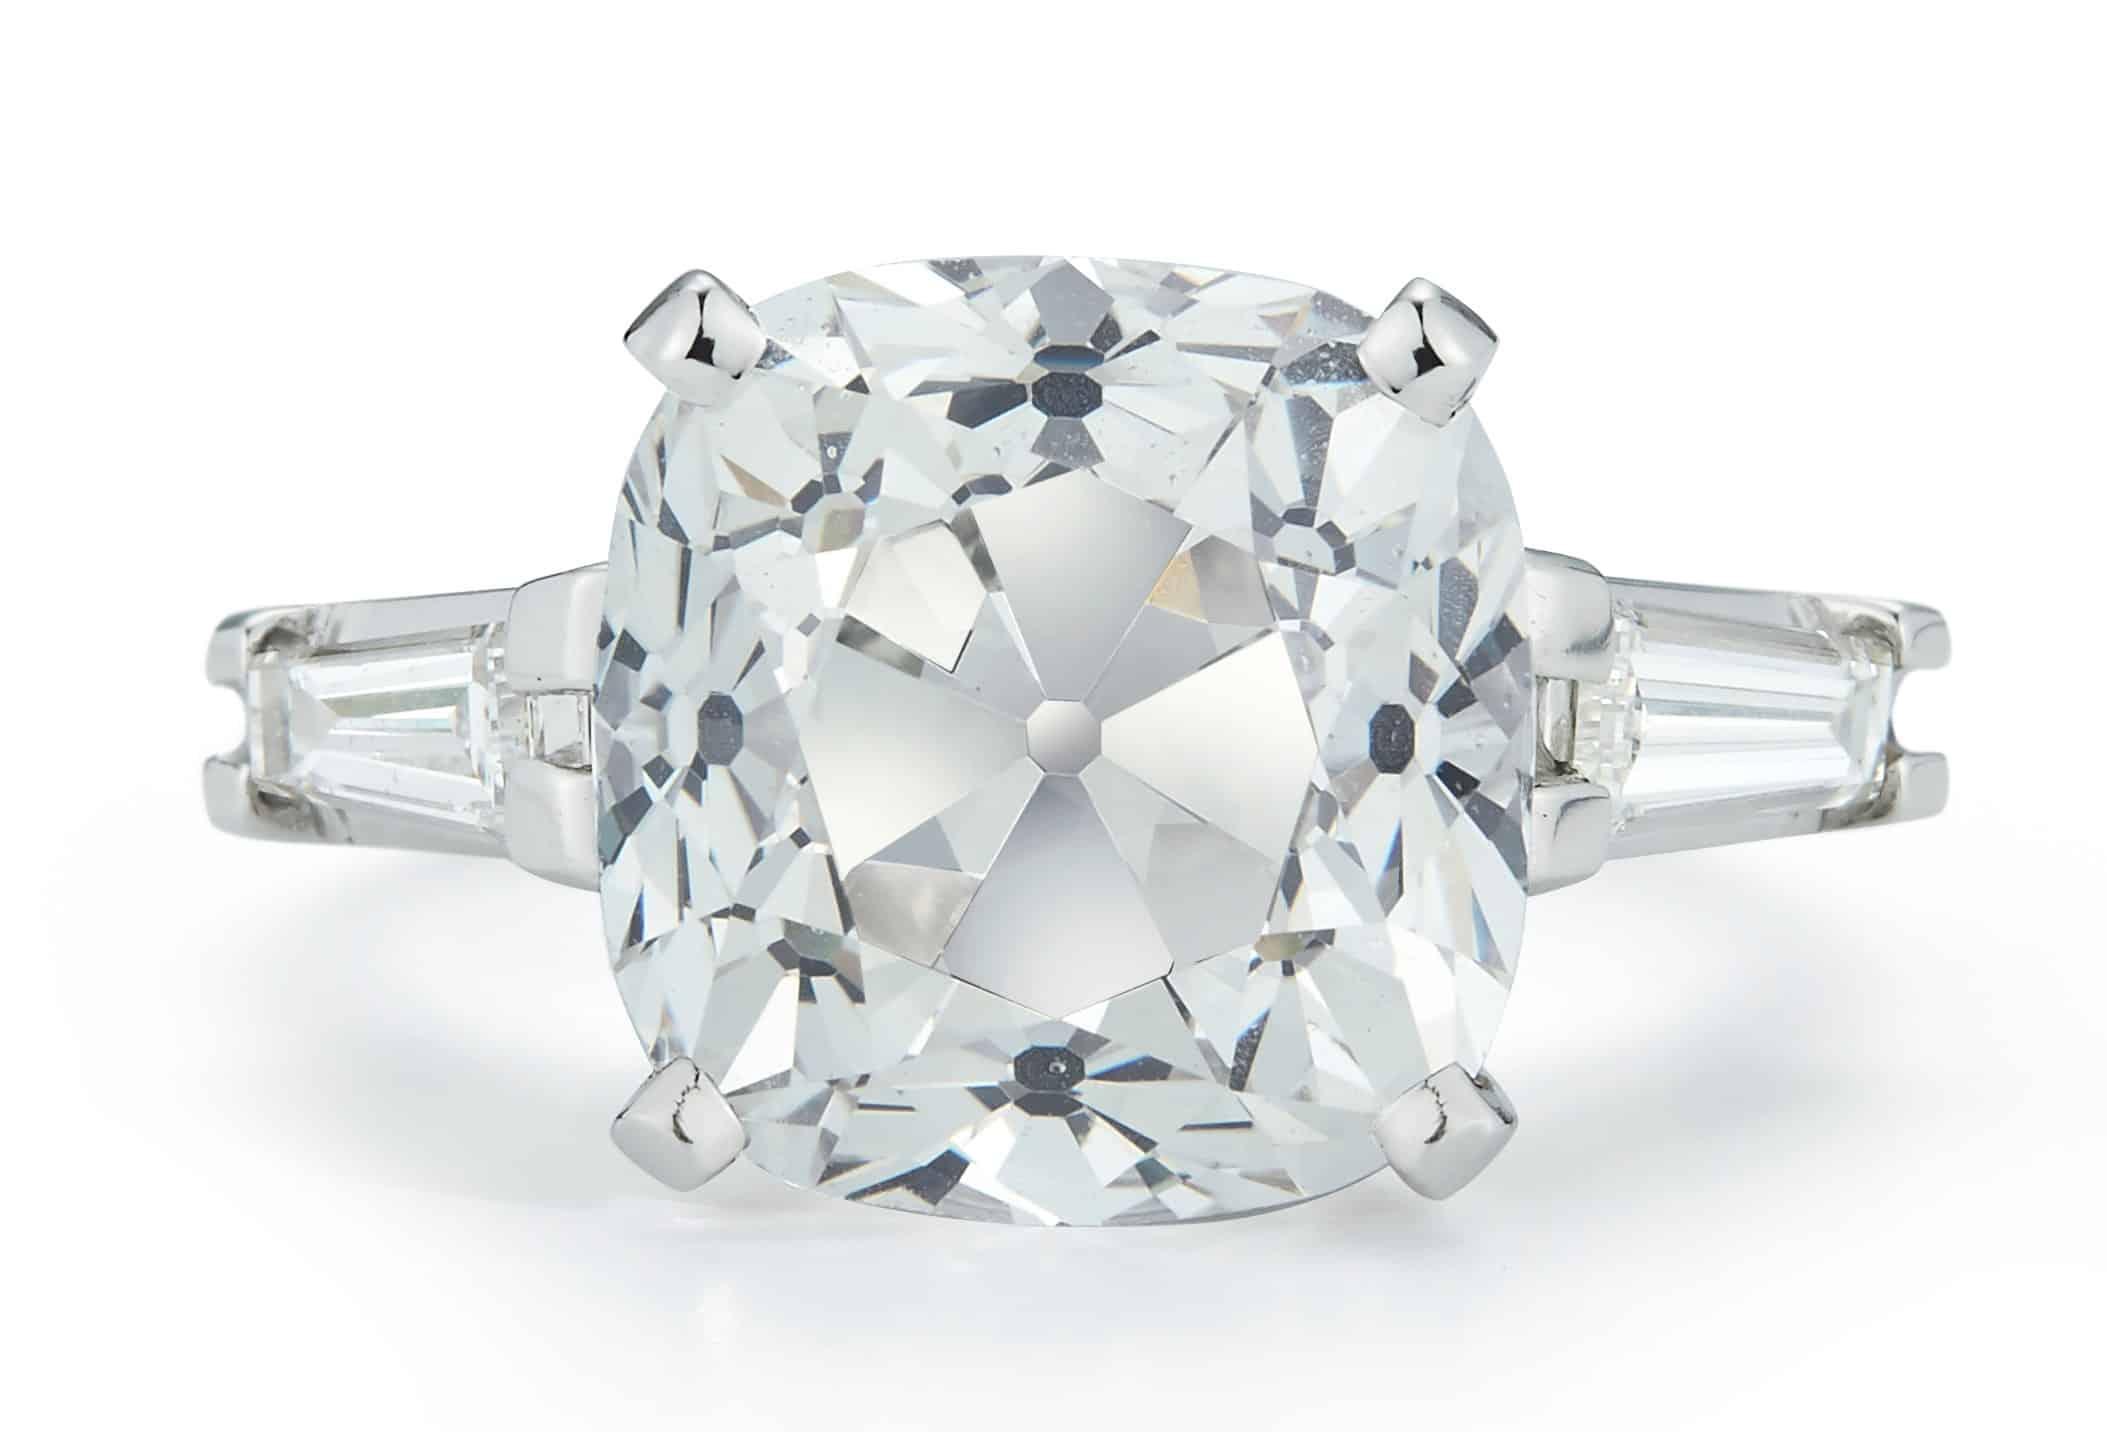 Old Mine Cut Diamonds Buying Guide The Diamond Pro